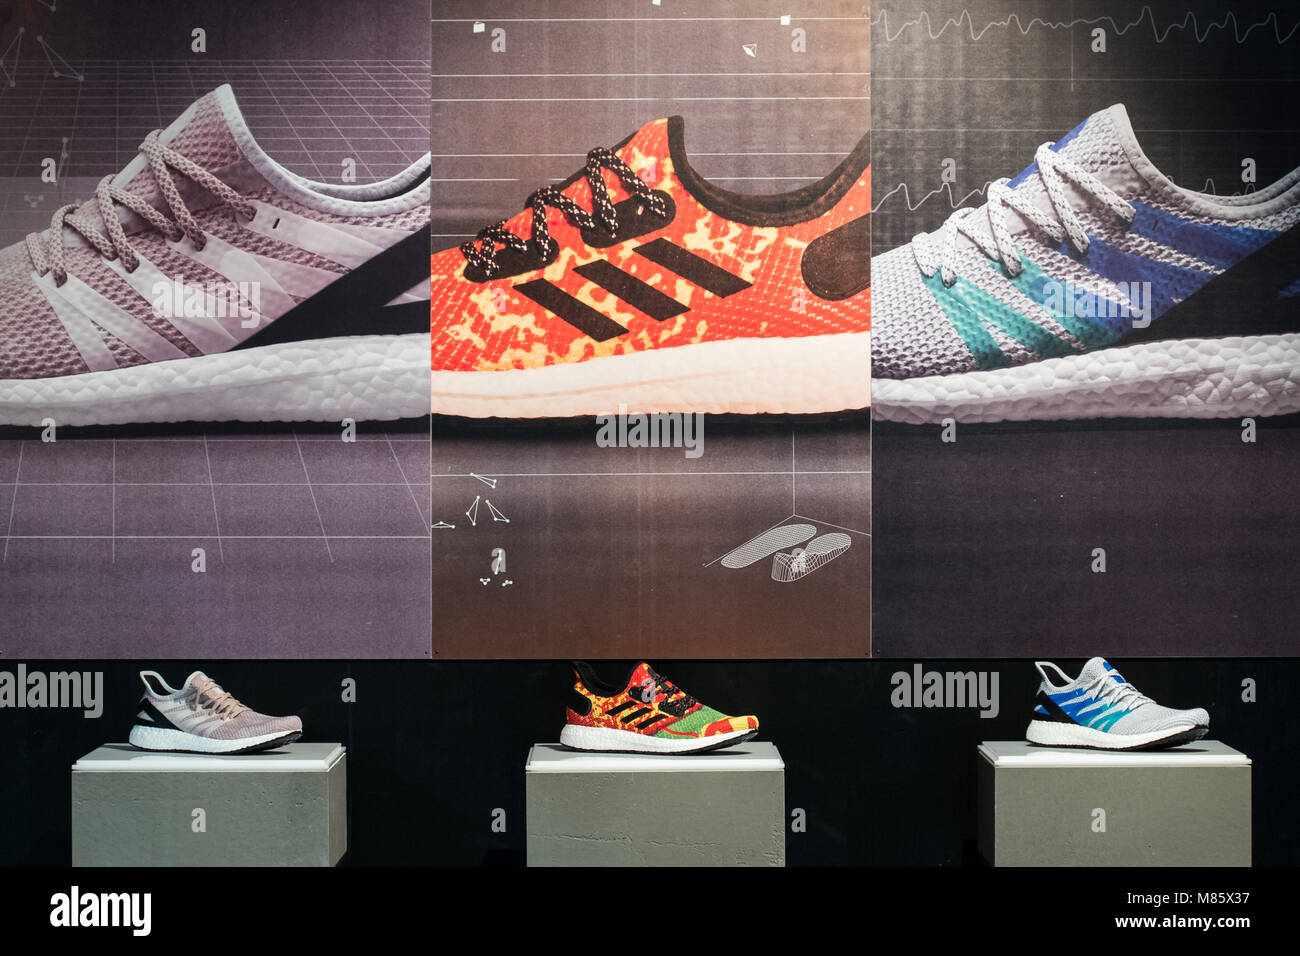 Adidas Drop Chaussure Adidas Drop Speedfactory Yb7yf6g